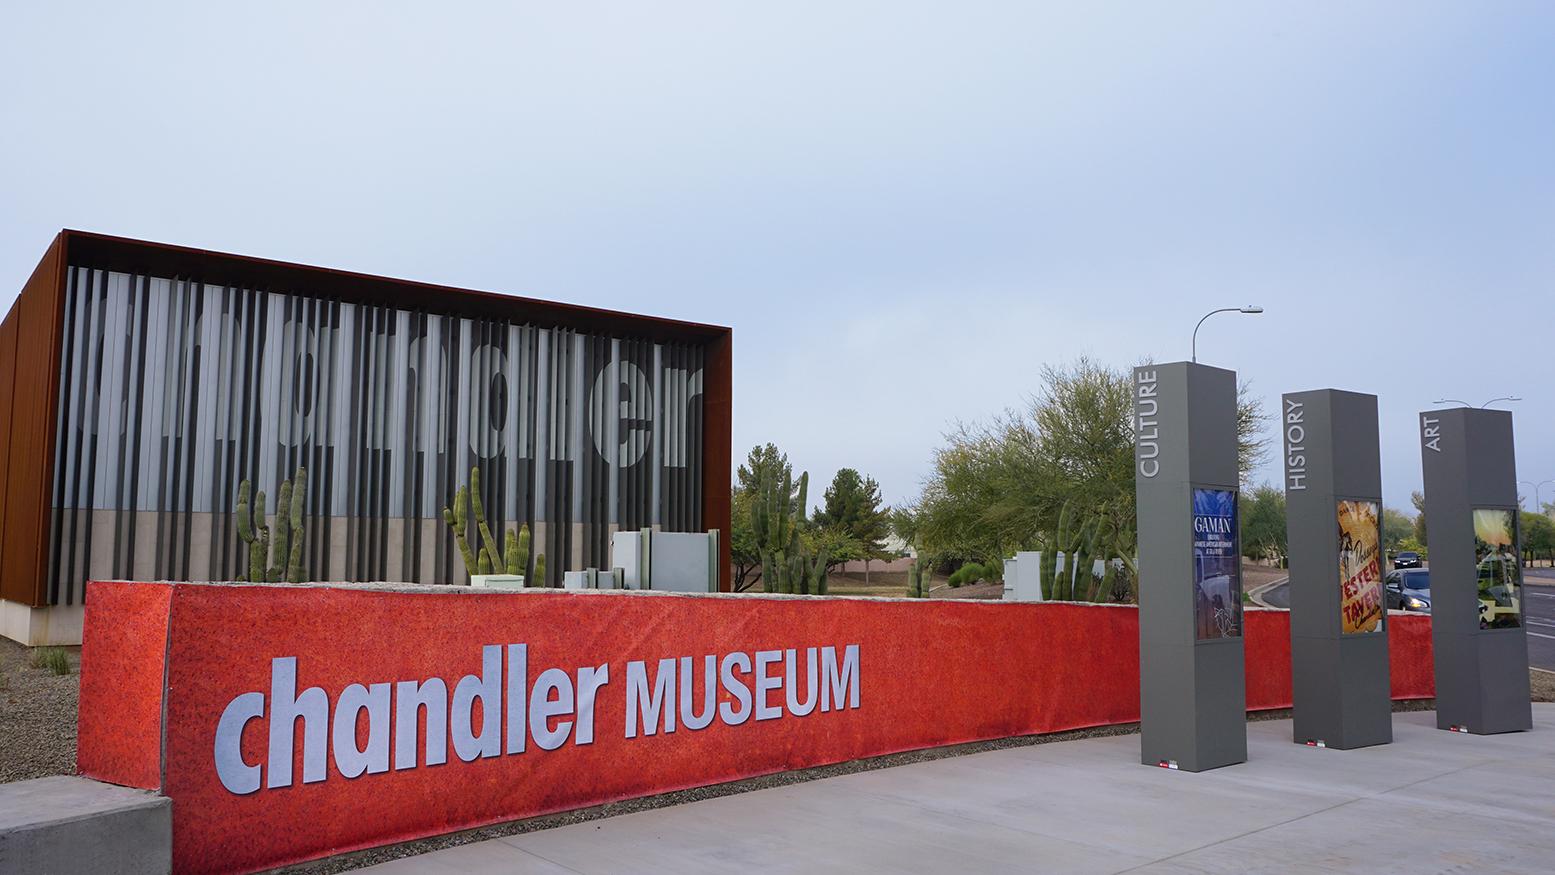 Chandler Museum.jpg